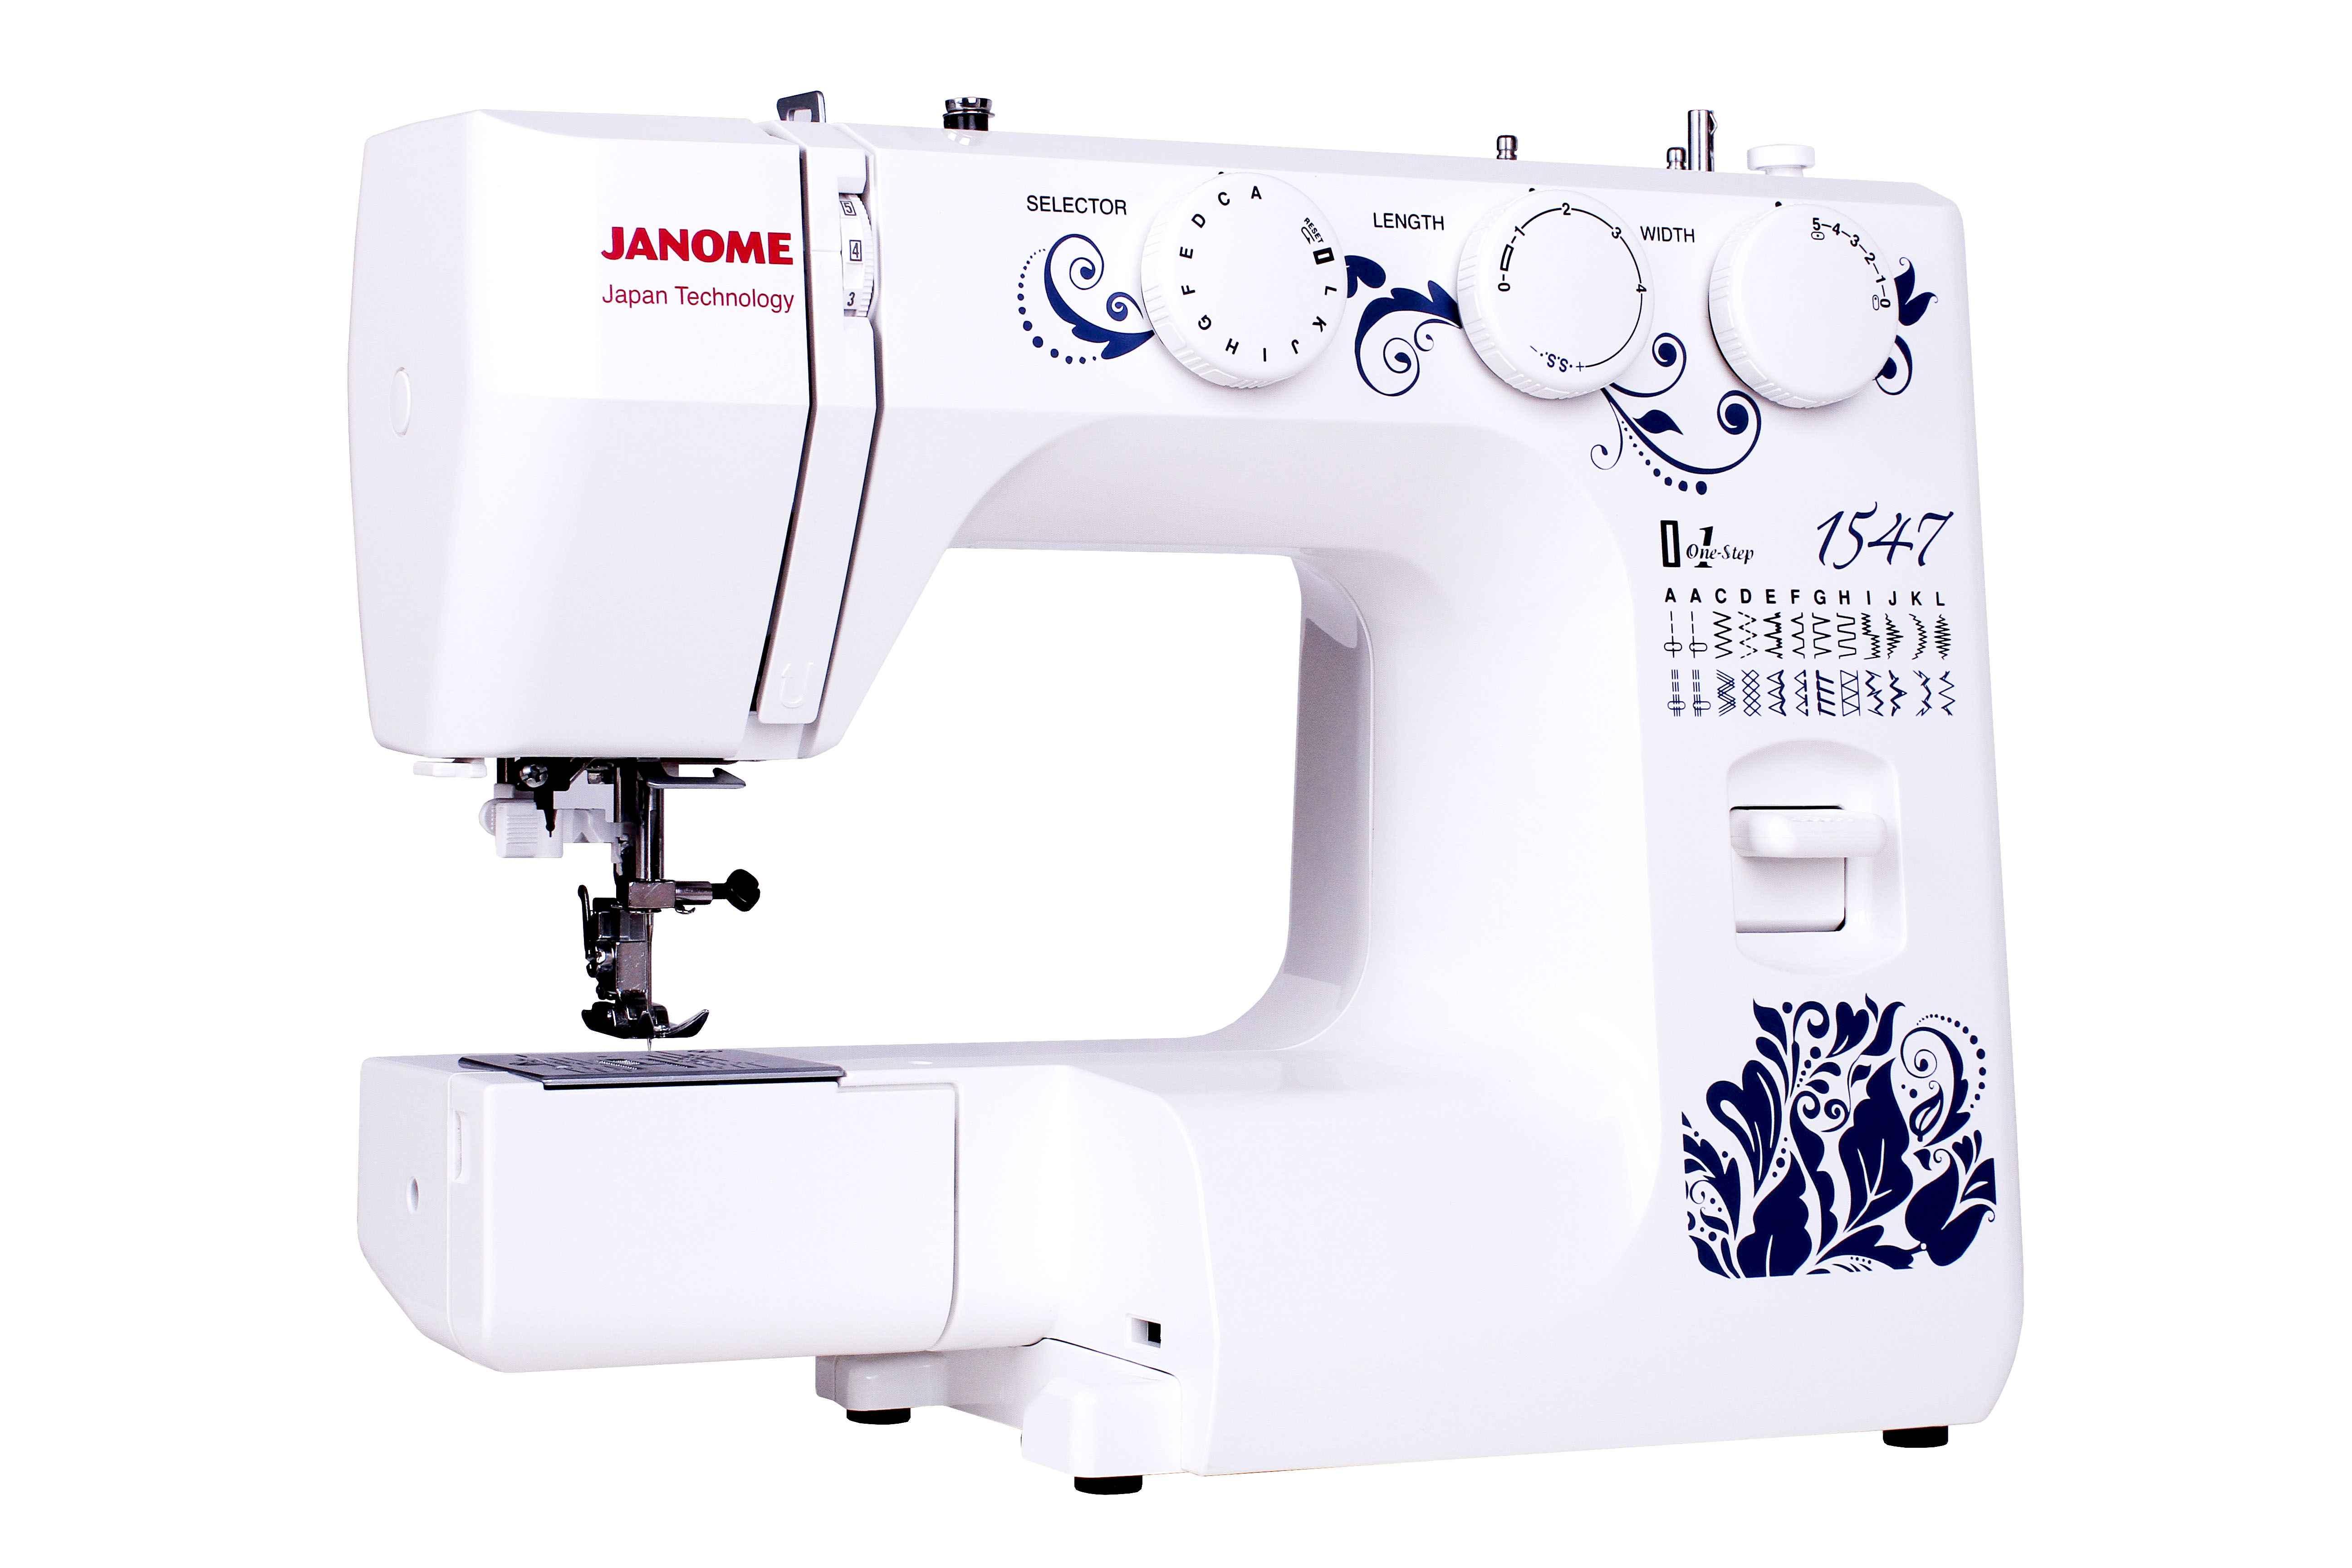 Швейная машина Janome 1547 швейная машинка janome dresscode